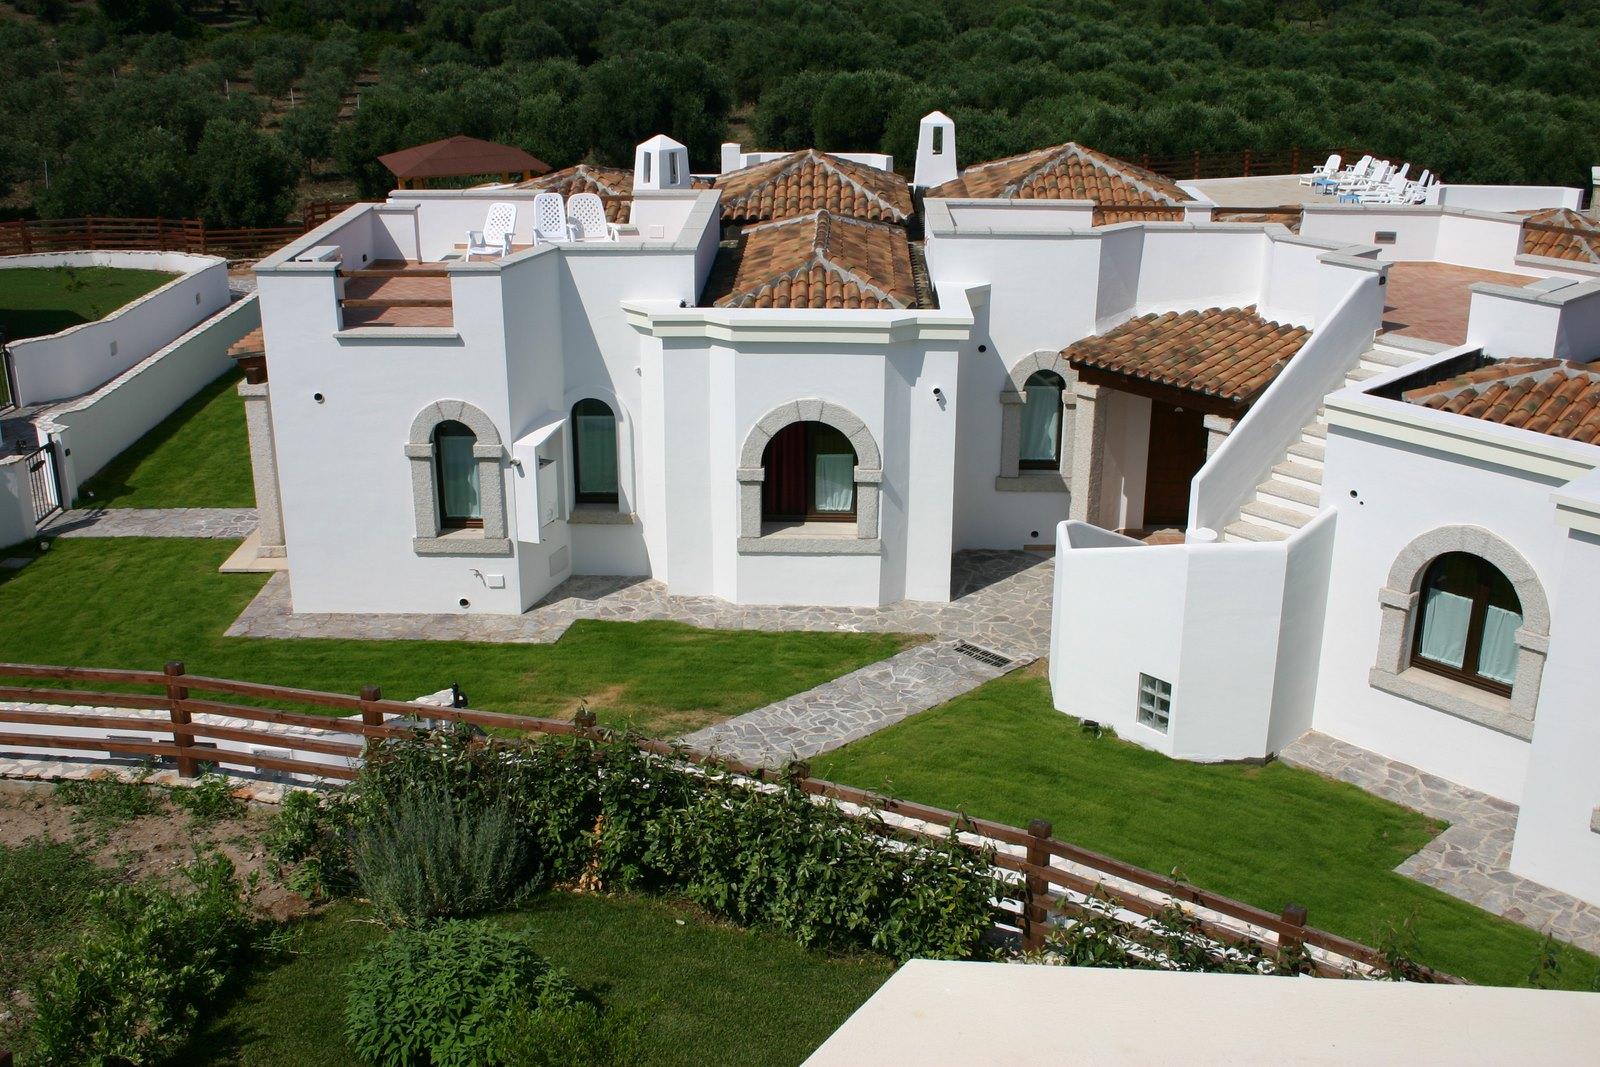 Ferienhaus Carru (877334), Sant Angelo Custode, Sassari, Sardinien, Italien, Bild 15